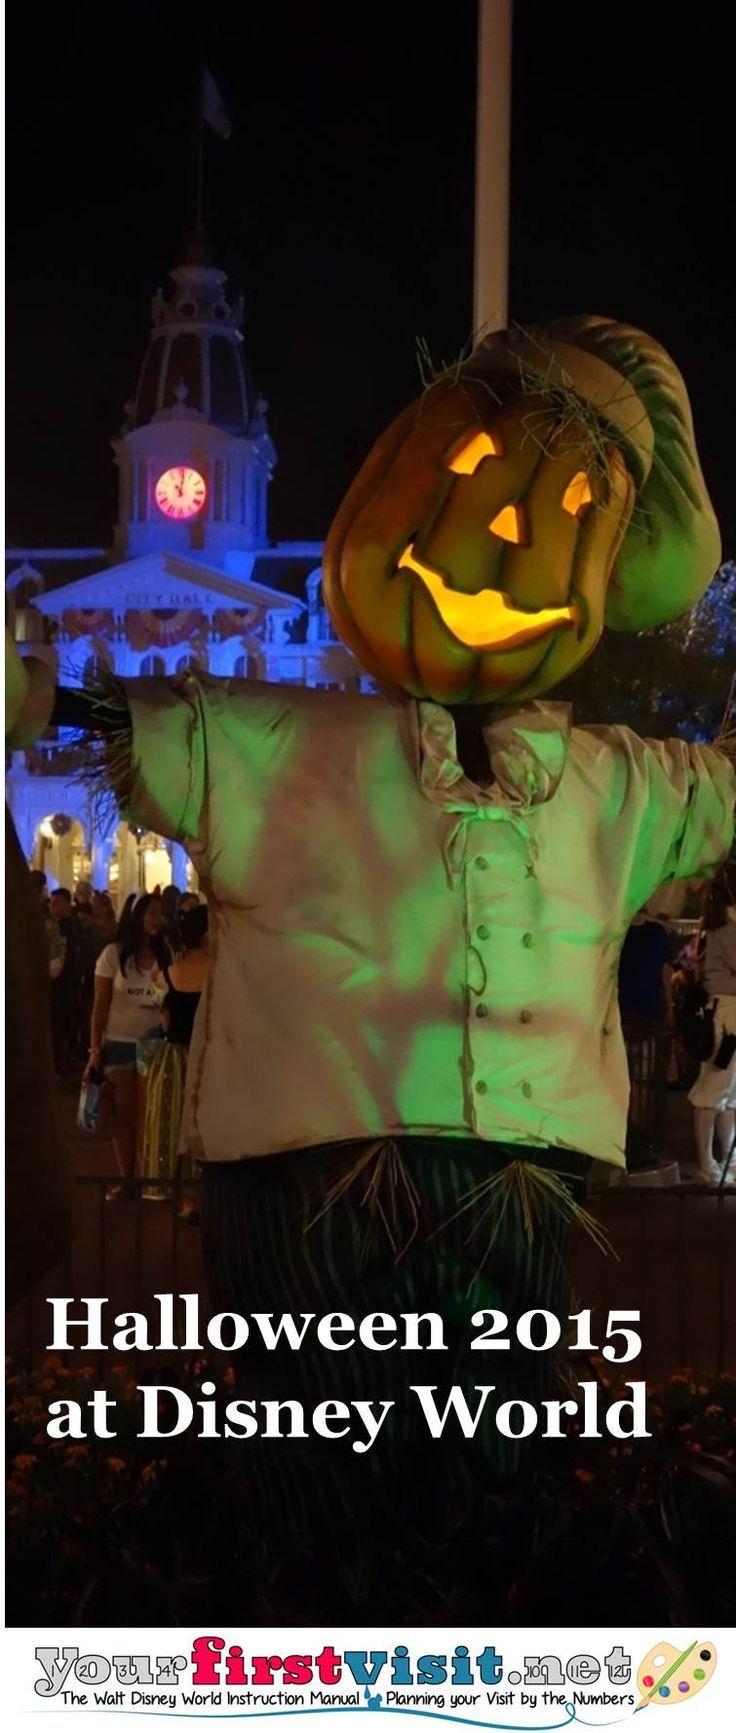 257 best Mickey's Halloween images on Pinterest